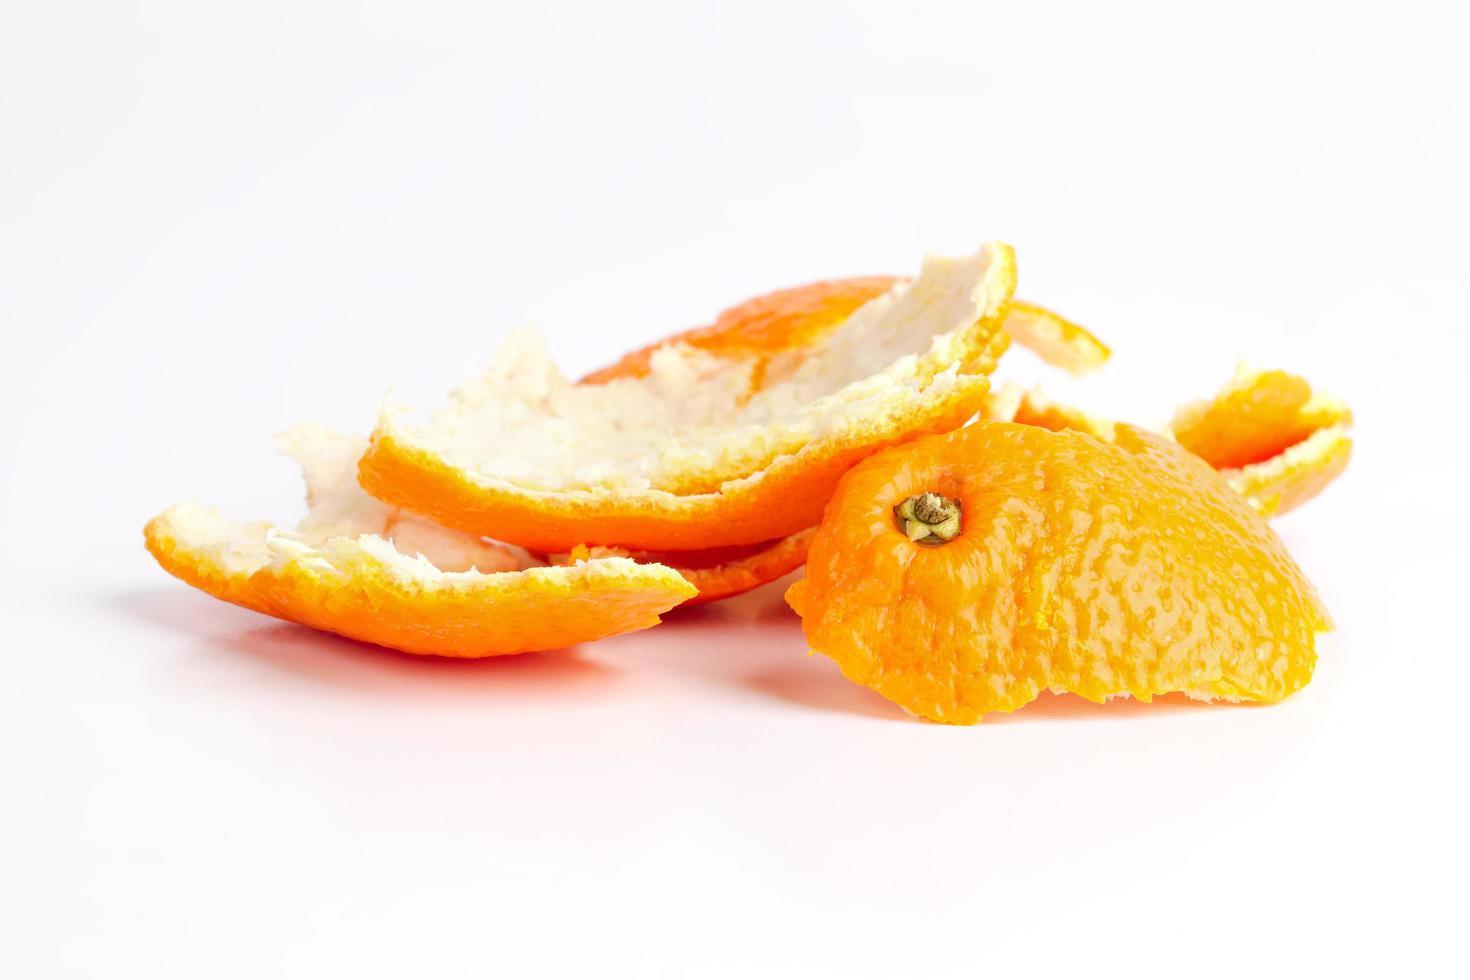 zeste de mandarine sur fond blanc photo